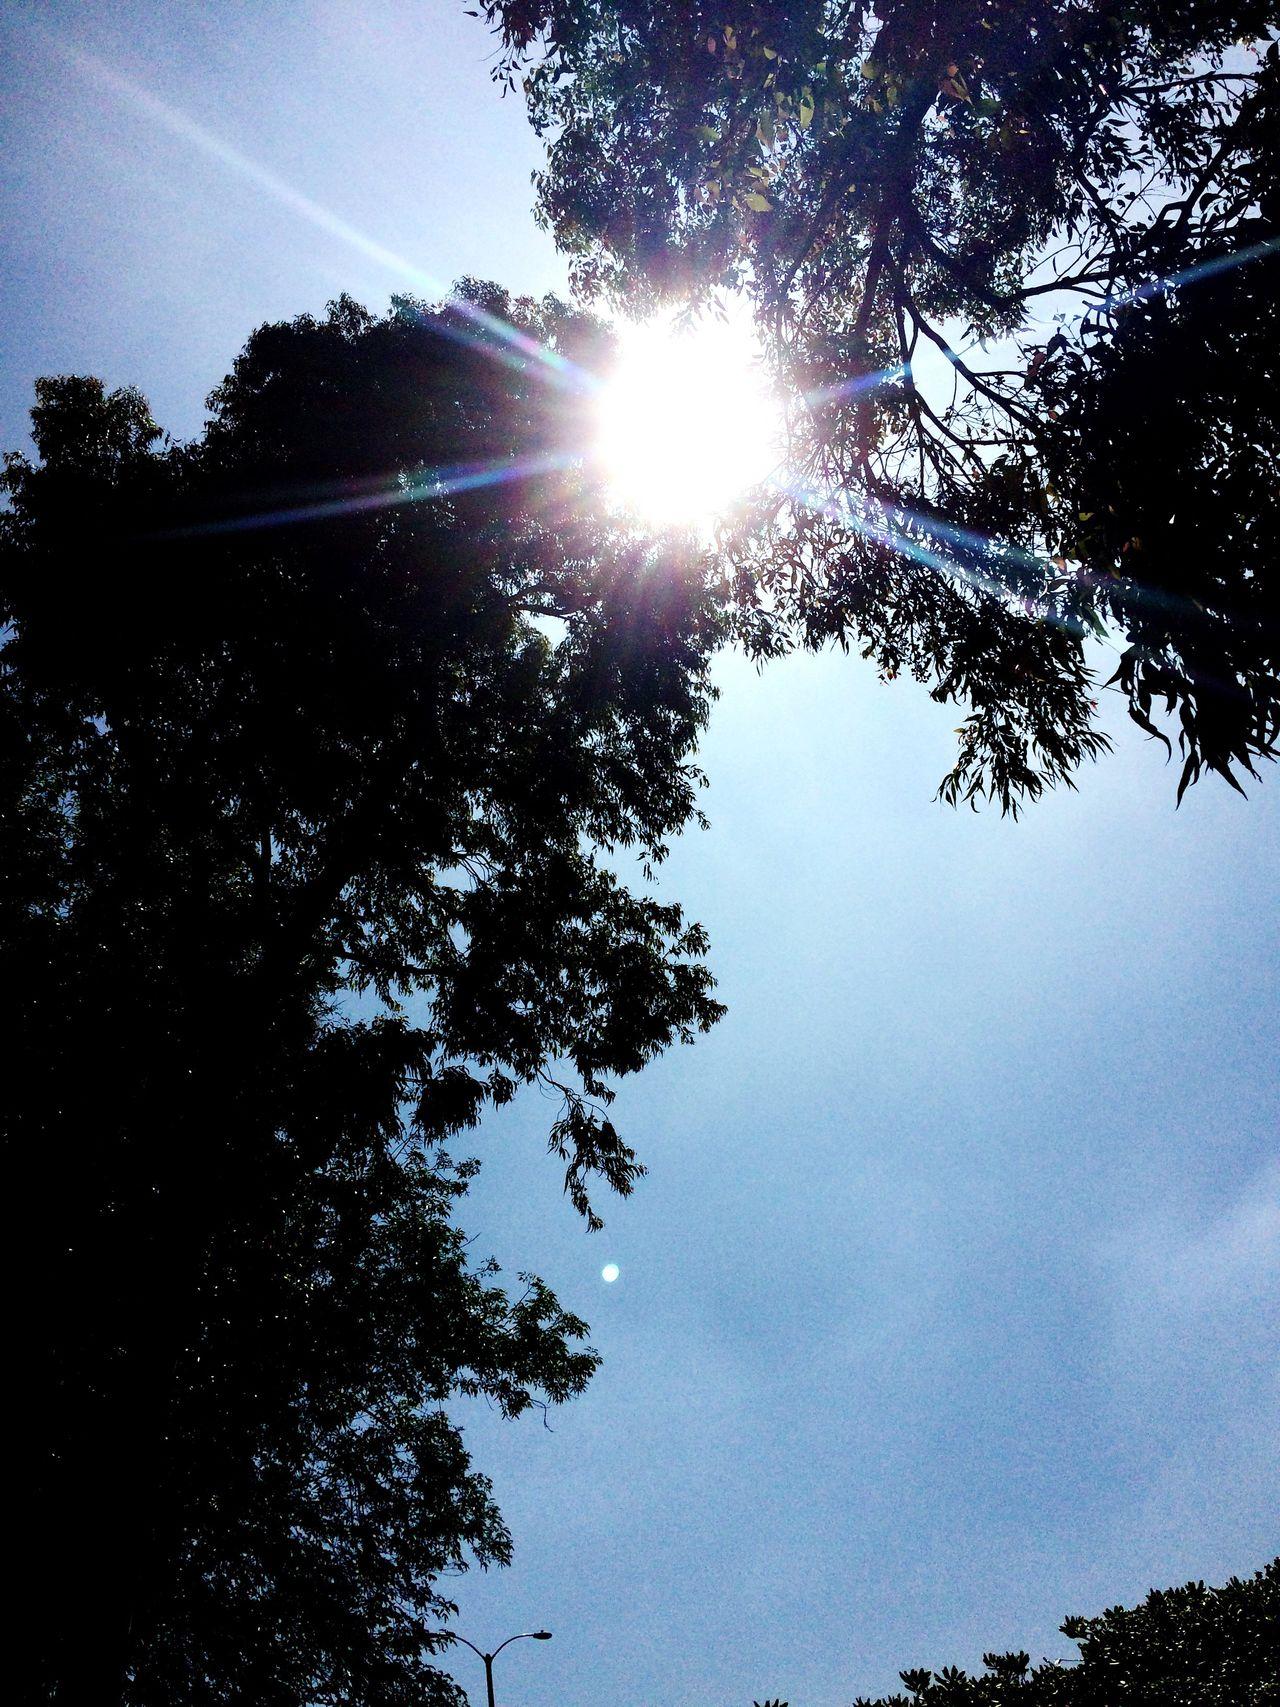 Tree Sun Sunbeam Lens Flare Sky Nature Beauty In Nature Outdoors Sunlight Day